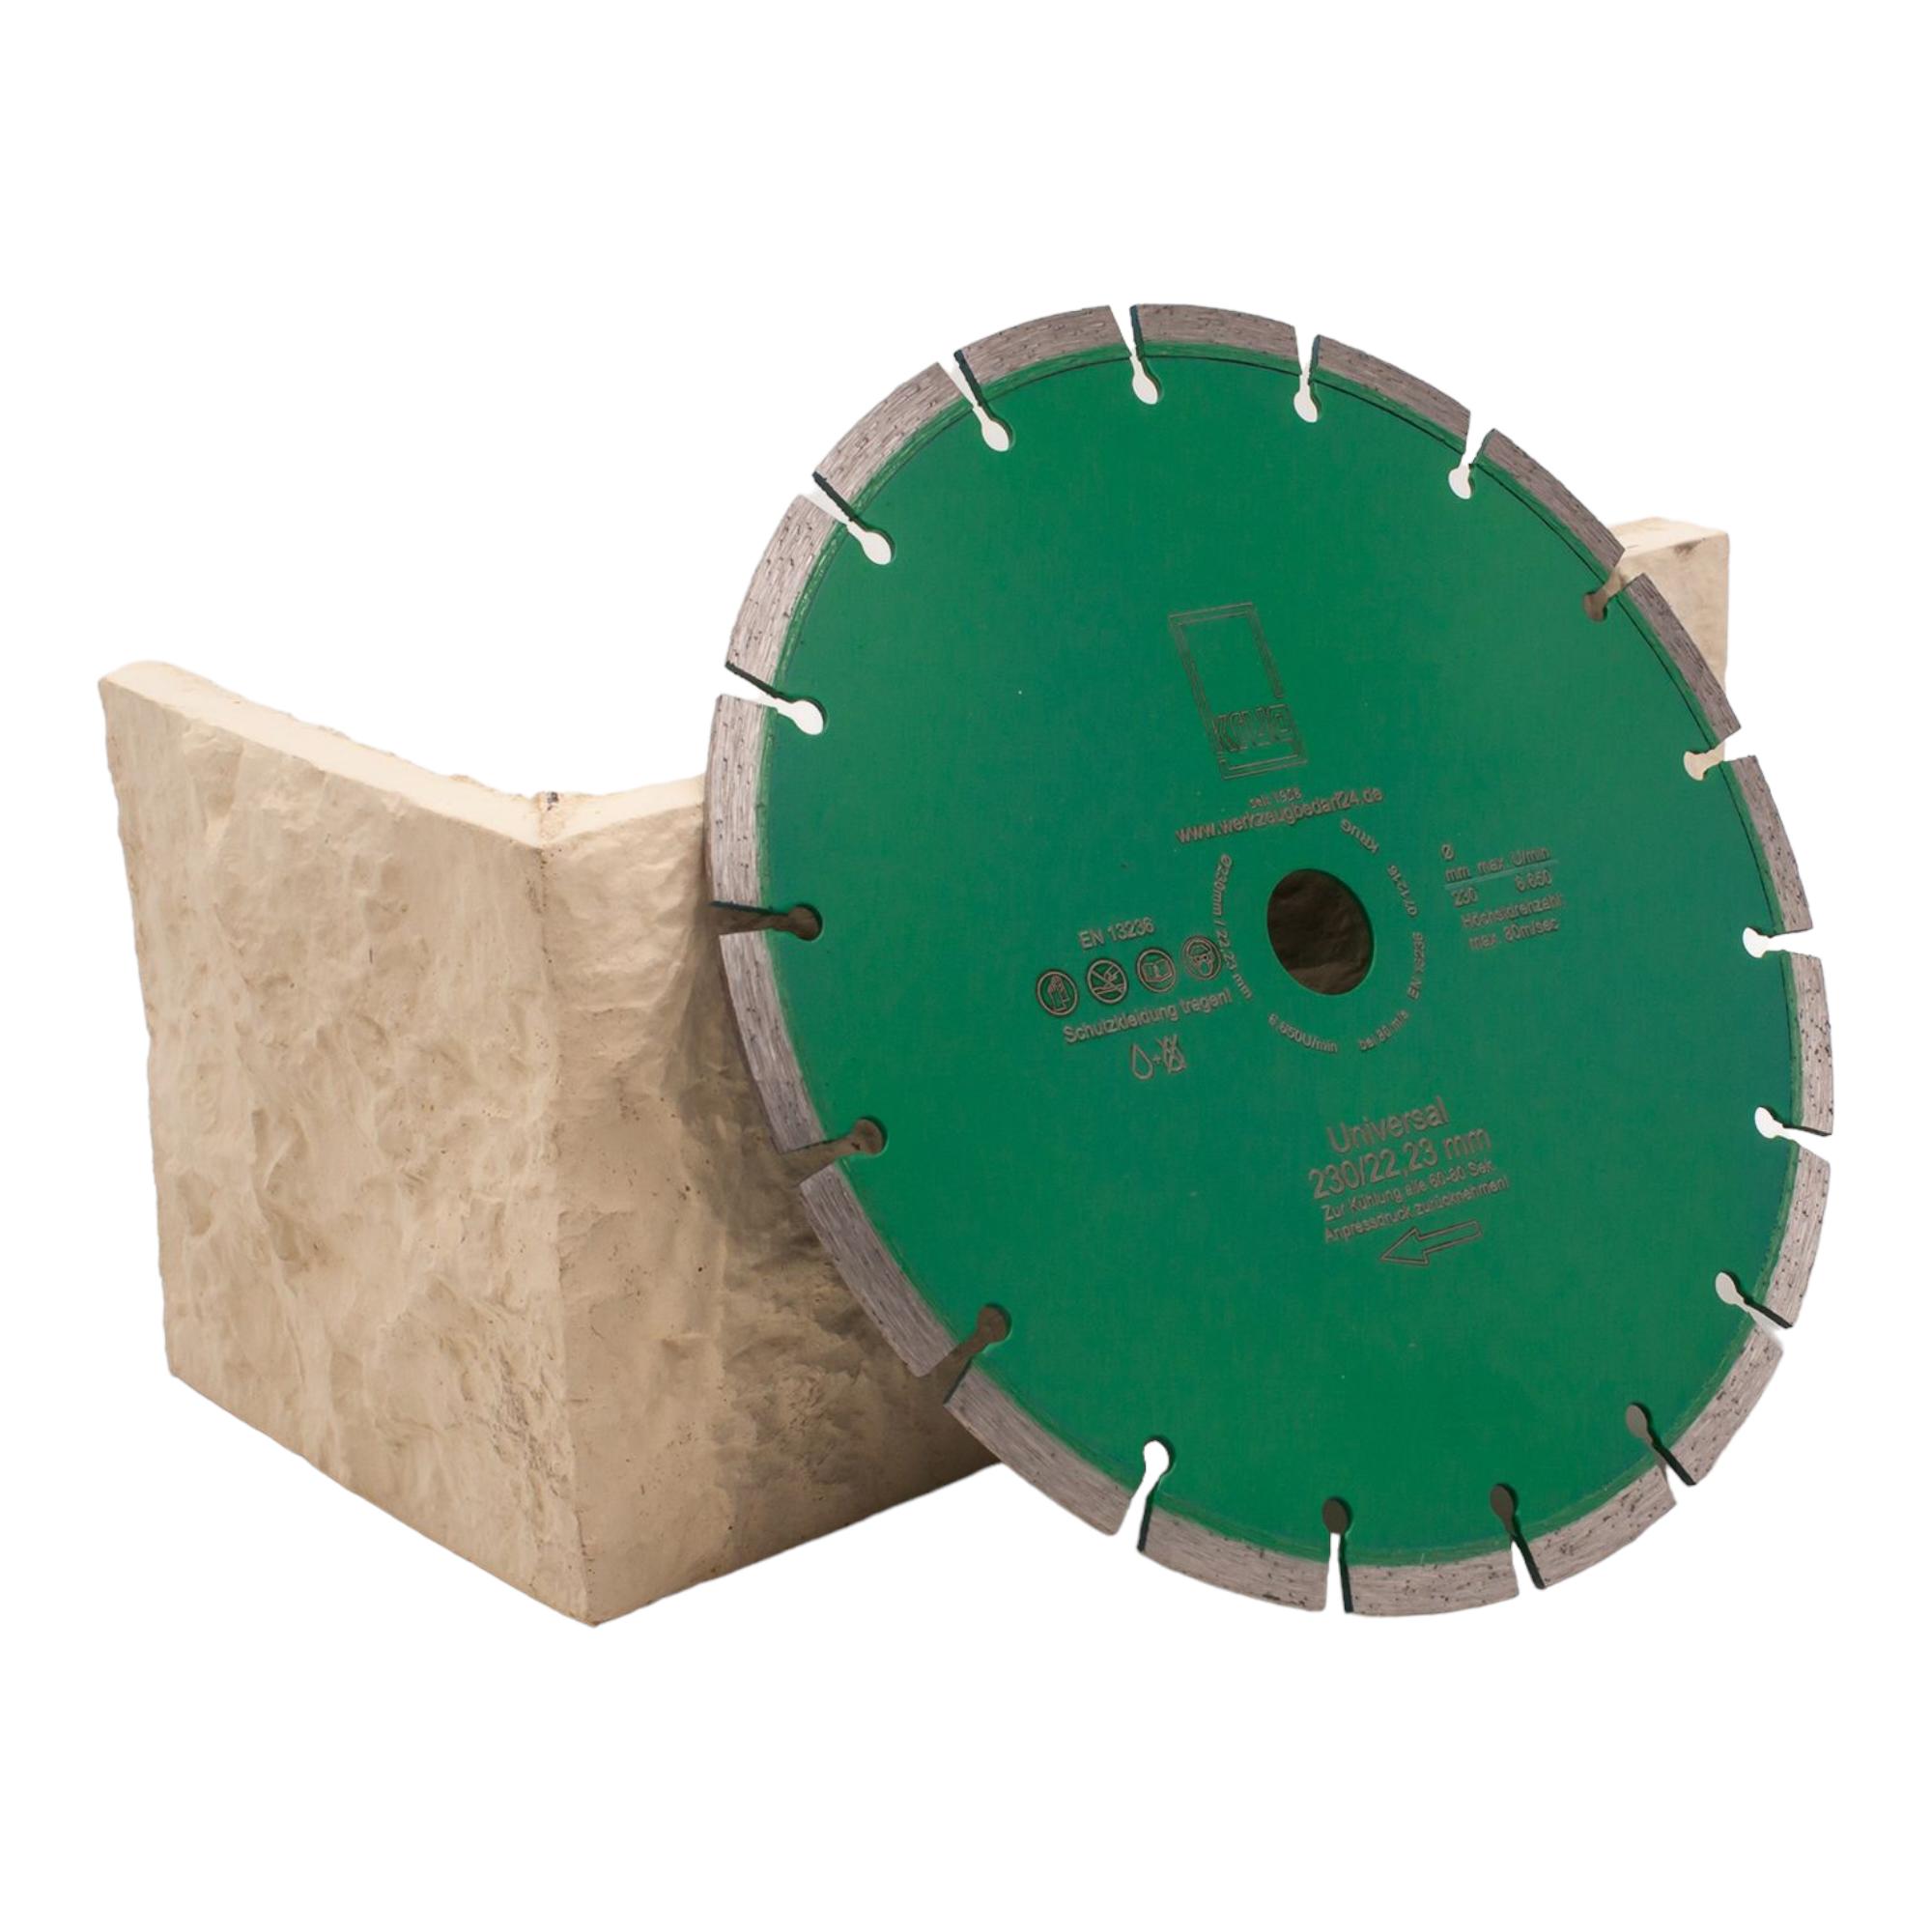 diamantscheibe green cut beton universal 230 mm 3st. Black Bedroom Furniture Sets. Home Design Ideas